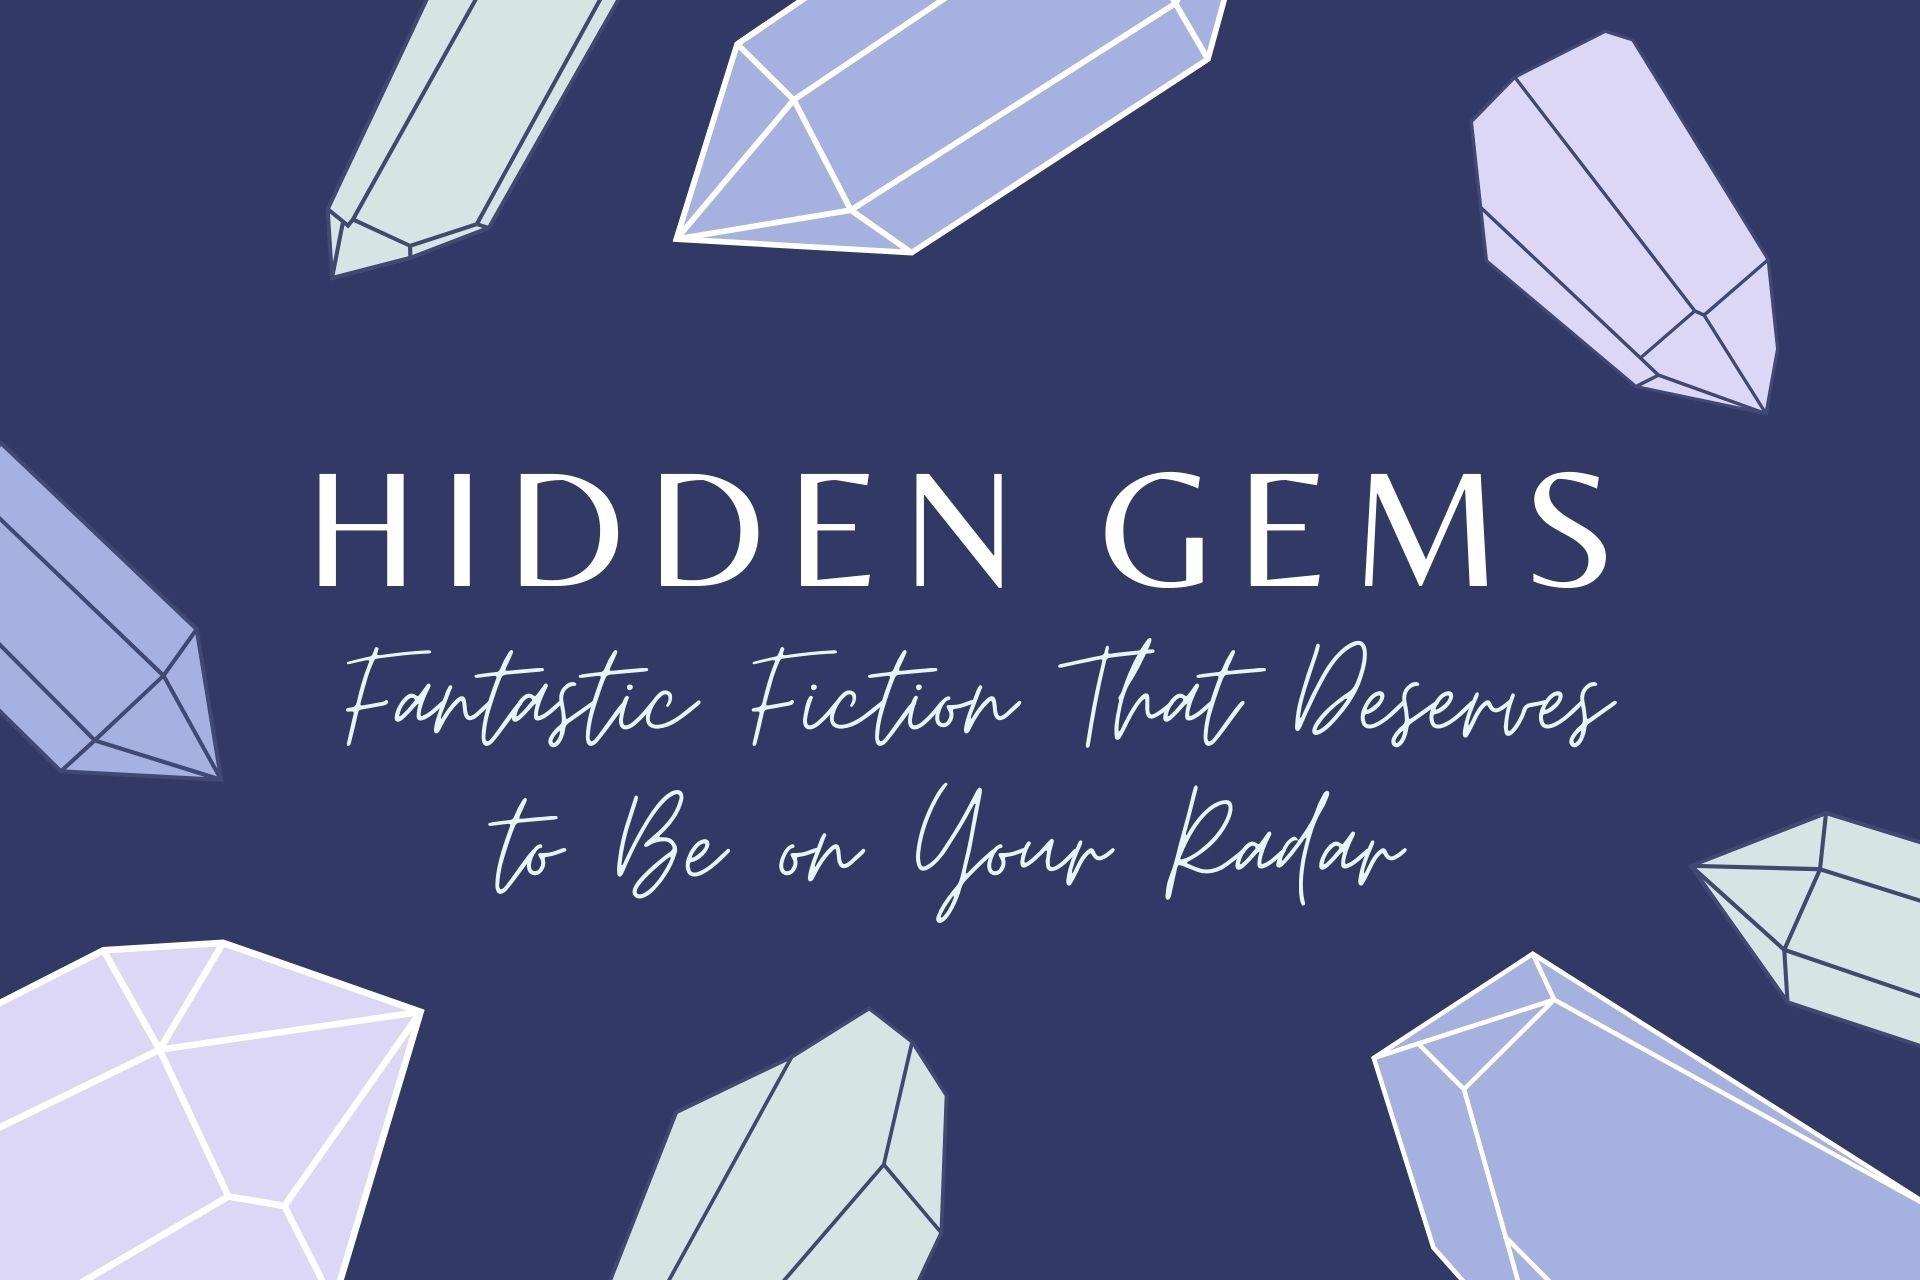 30 Hidden Gems - Fantastic Fiction That Deserves to Be on Your Radar